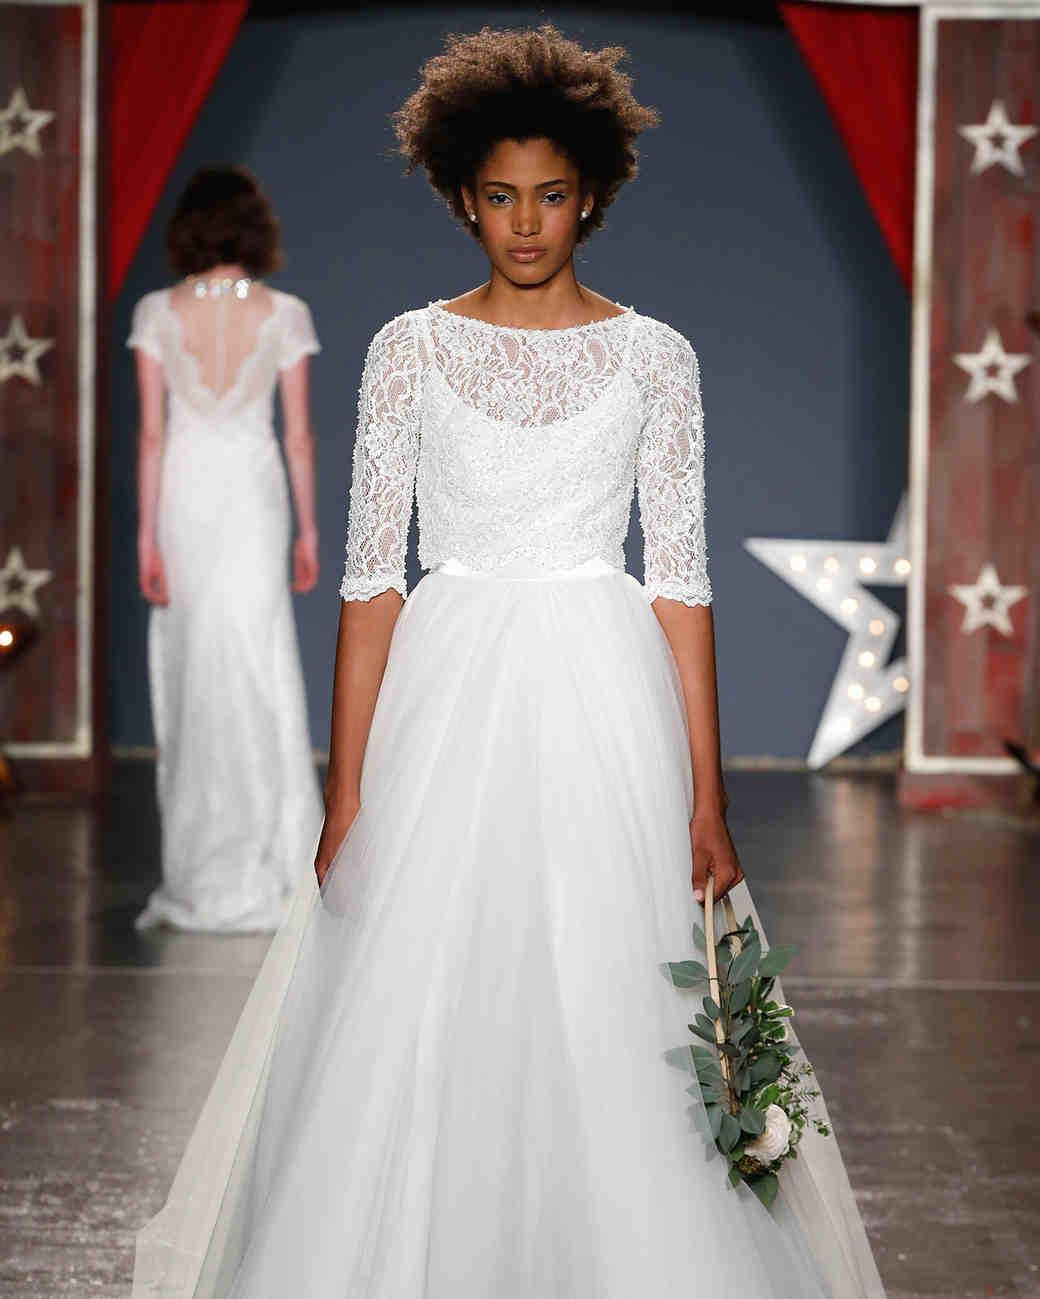 jenny packham wedding dress spring 2018 three-quarter length sleeves ballgown